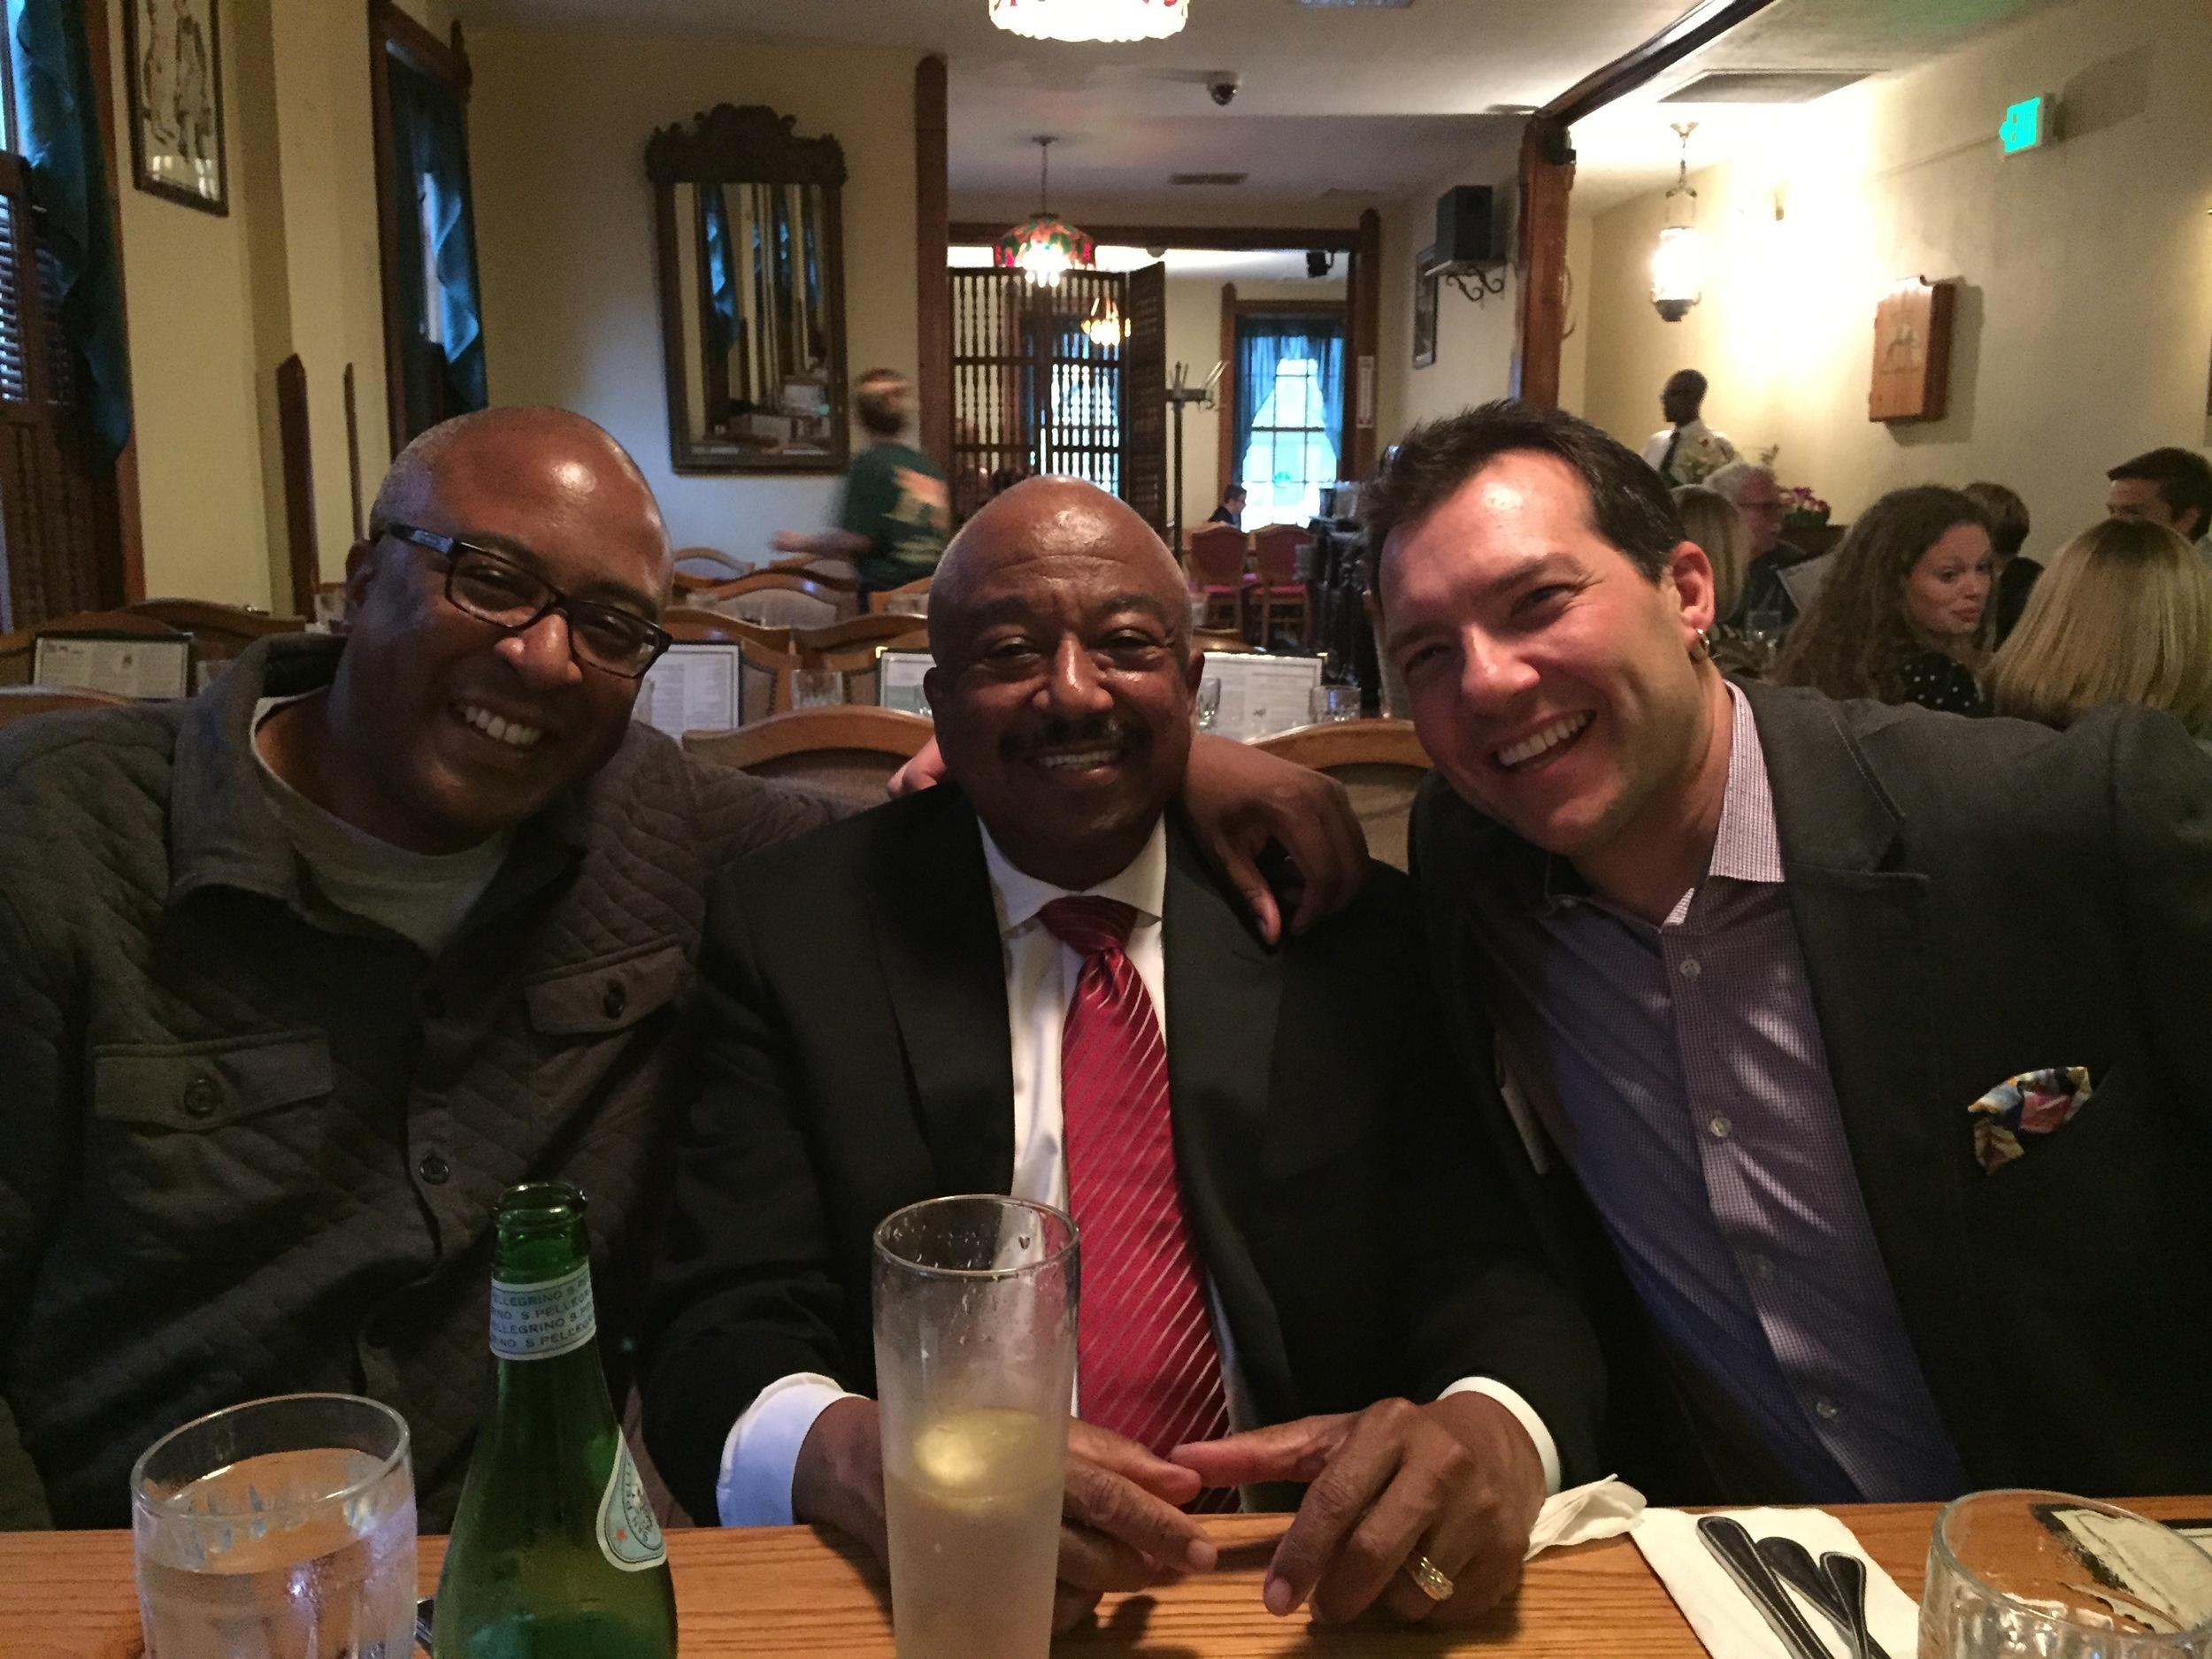 With Duane Davis and Keith Hall